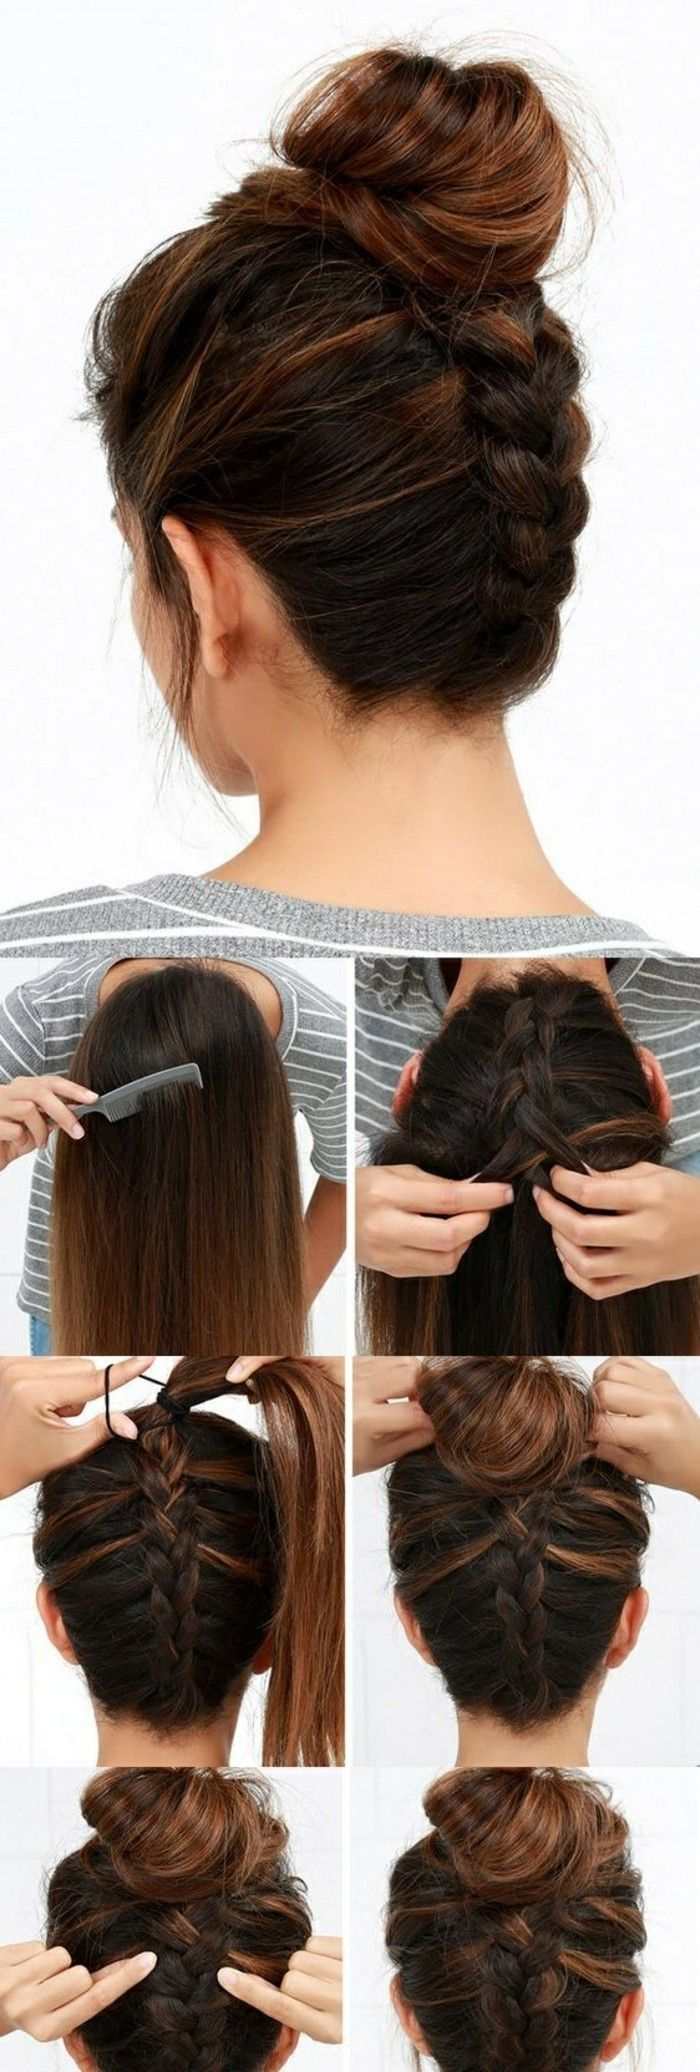 id e tendance coupe coiffure femme 2017 2018 frisuren hair pinterest coiffure. Black Bedroom Furniture Sets. Home Design Ideas